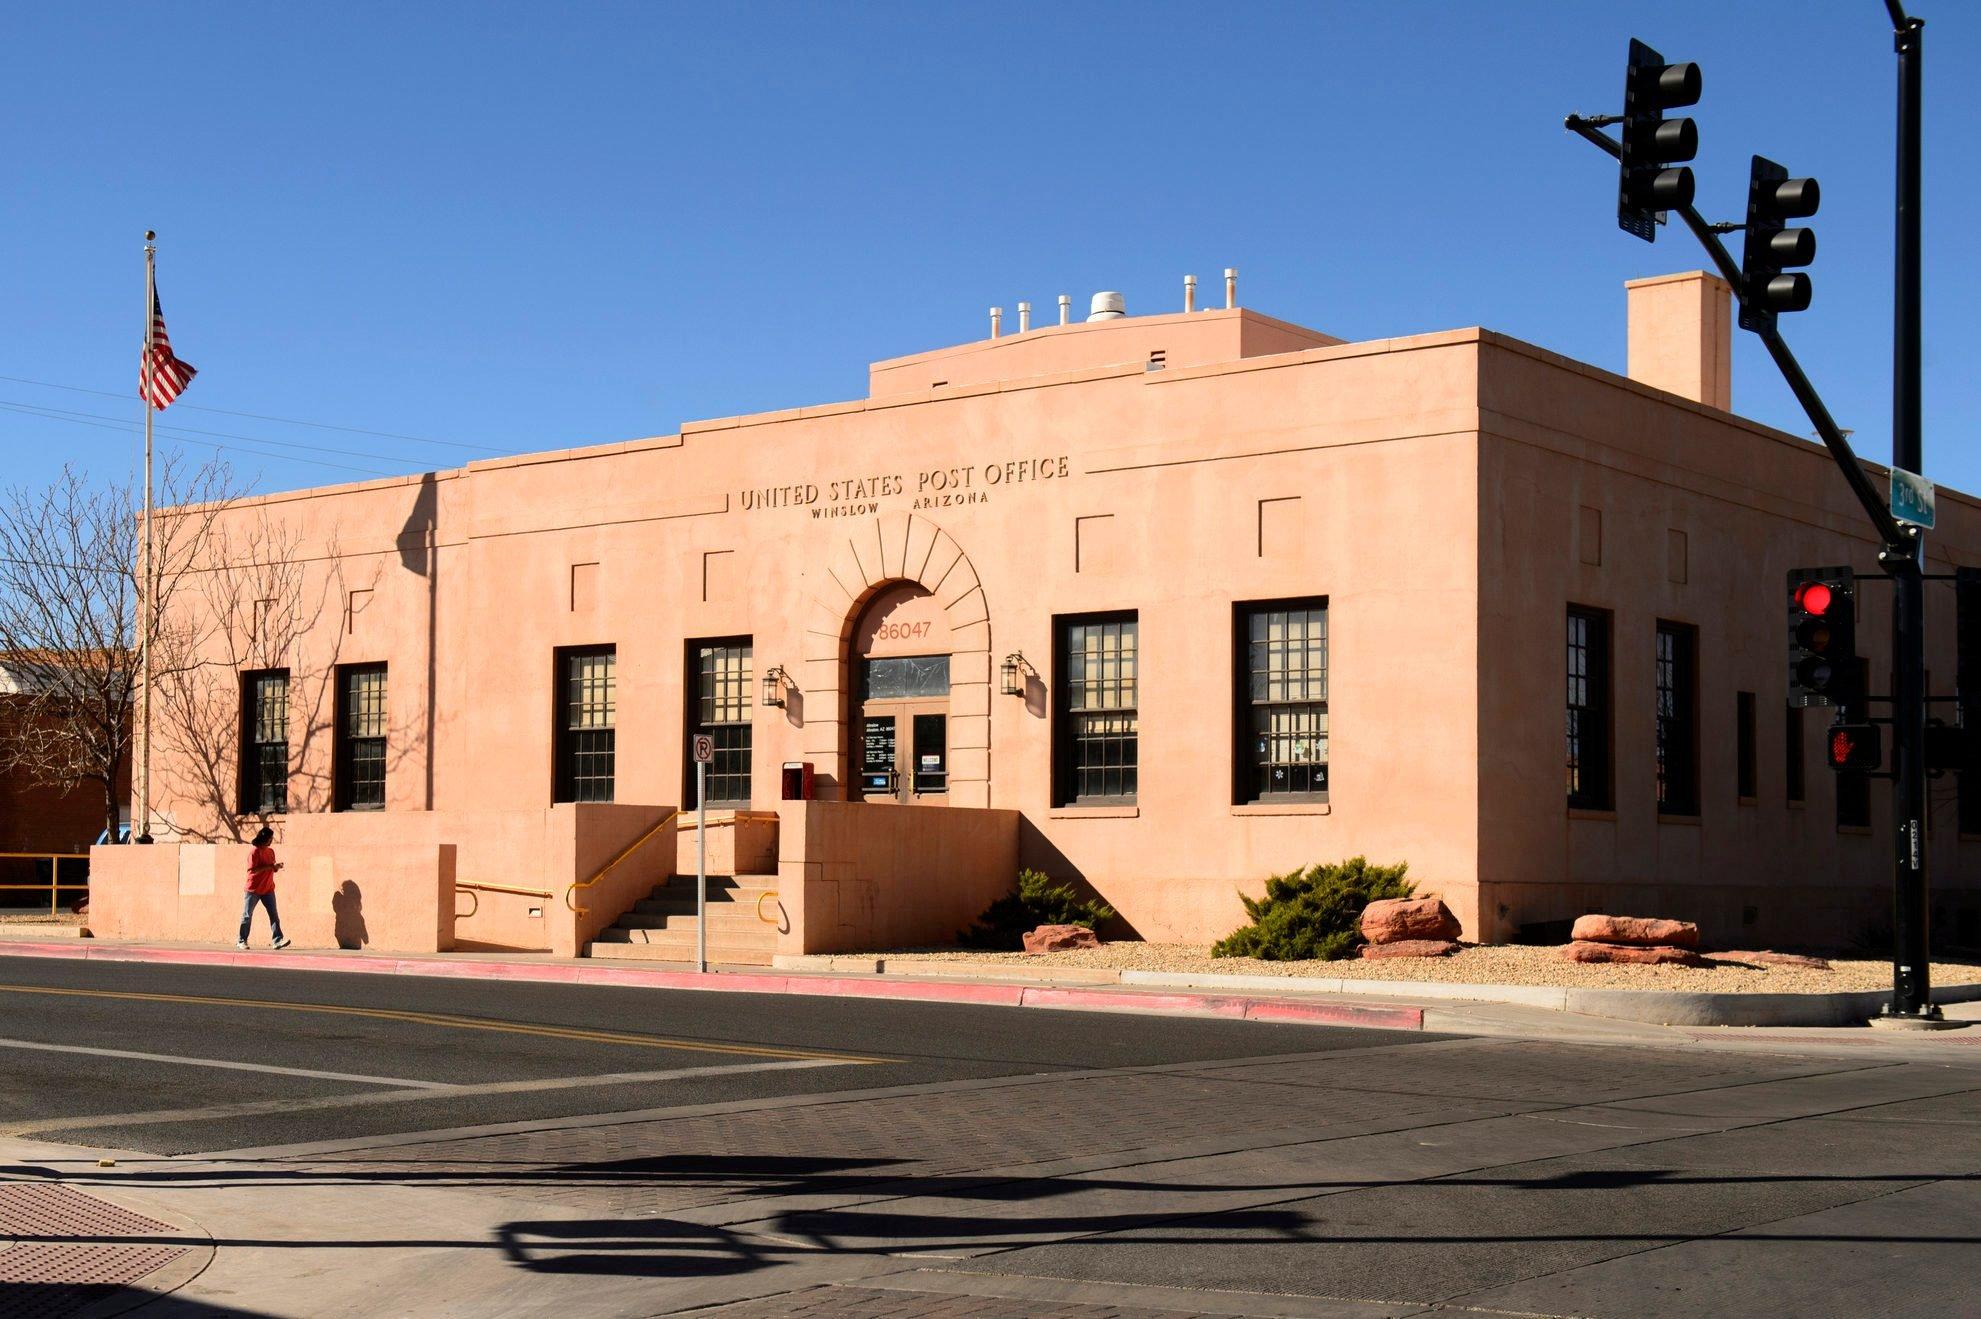 Post office at Winslow, Arizona, USA